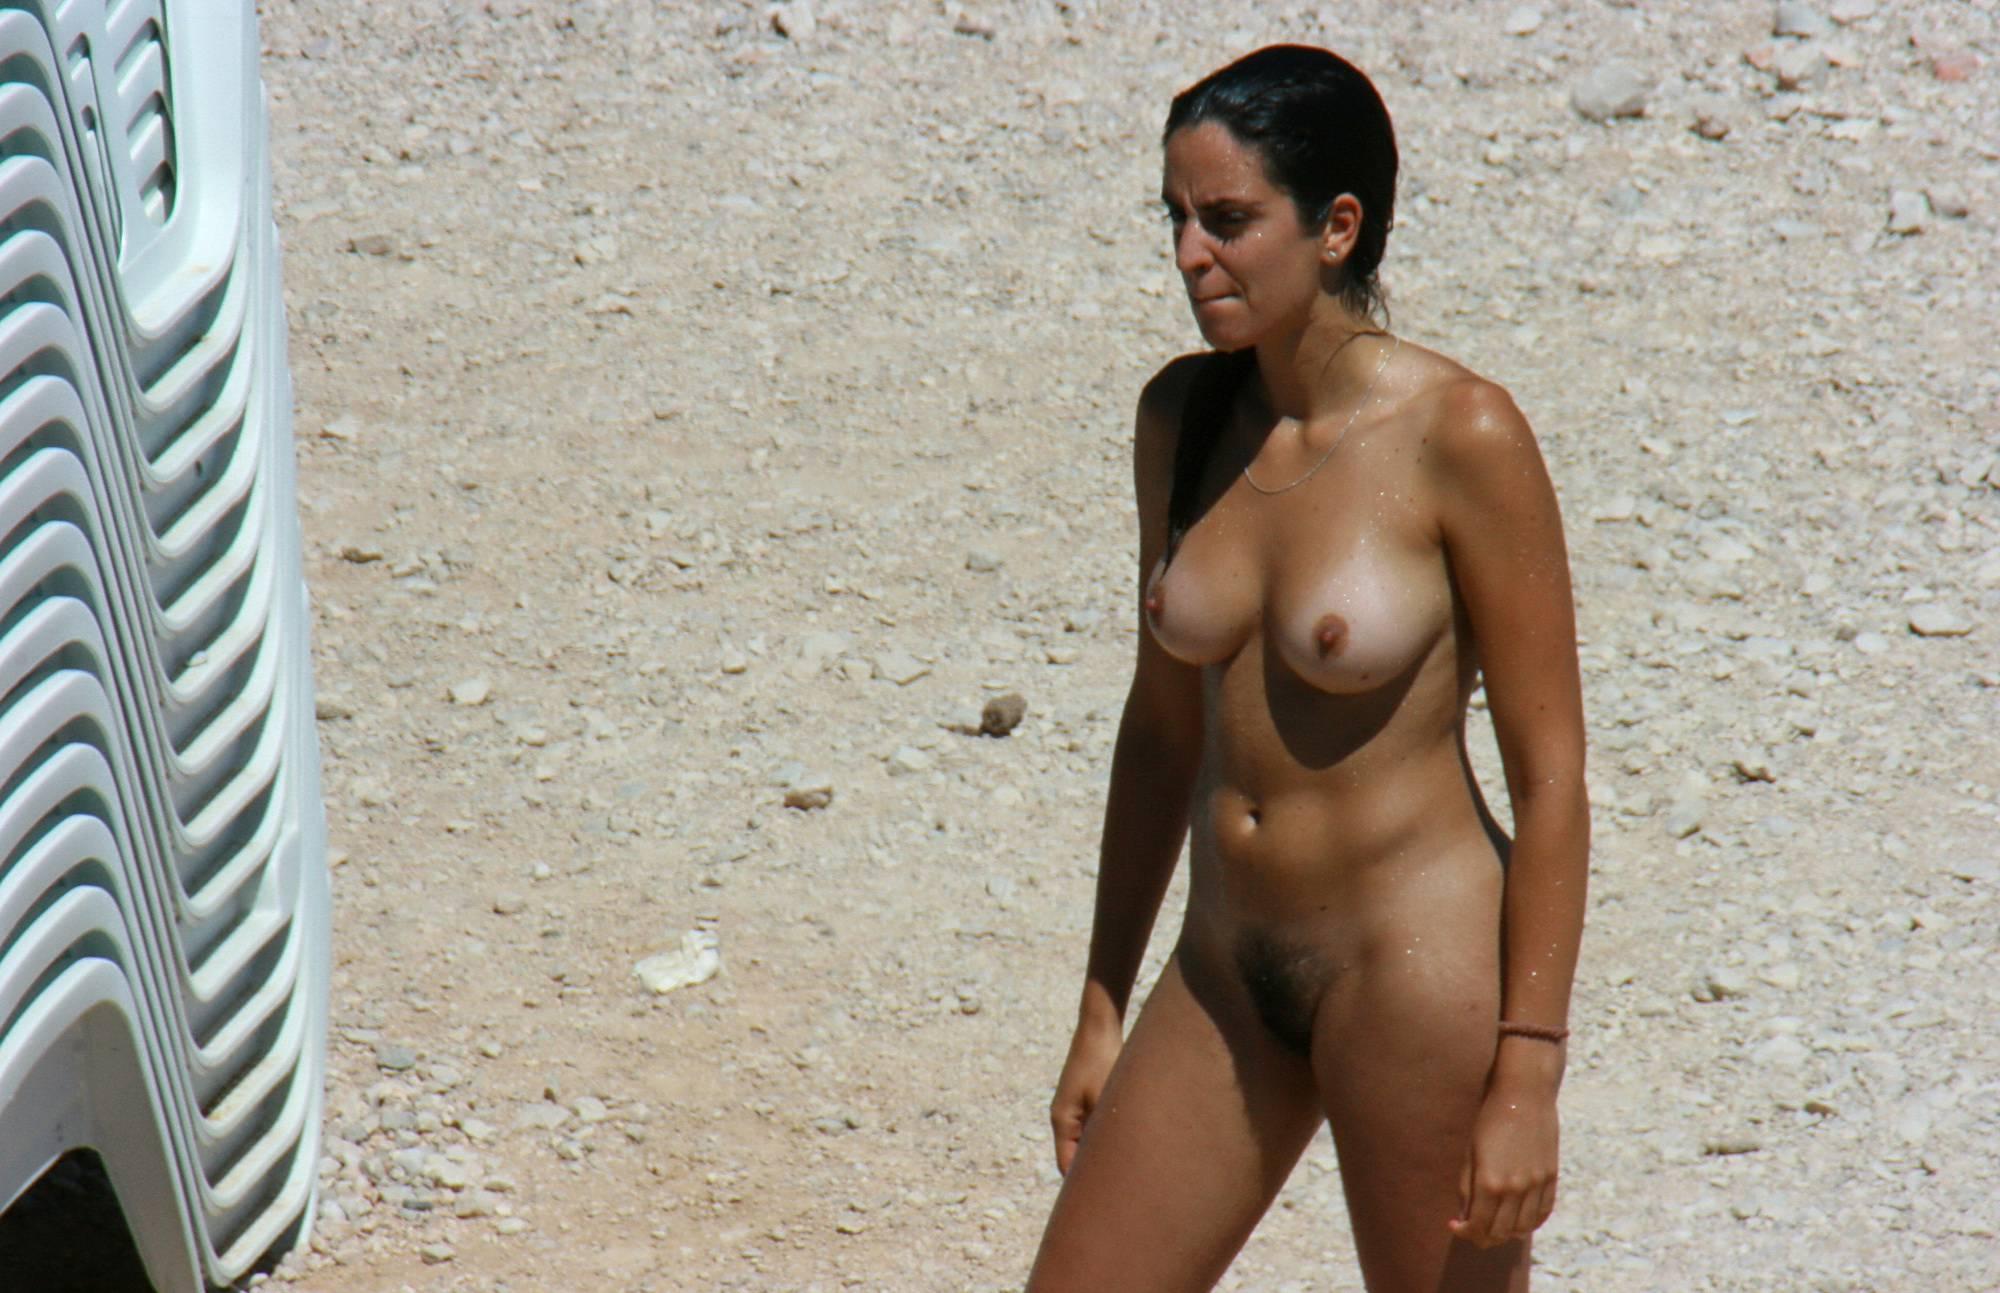 Nudist Gallery Leisurely Sand Strolling - 2